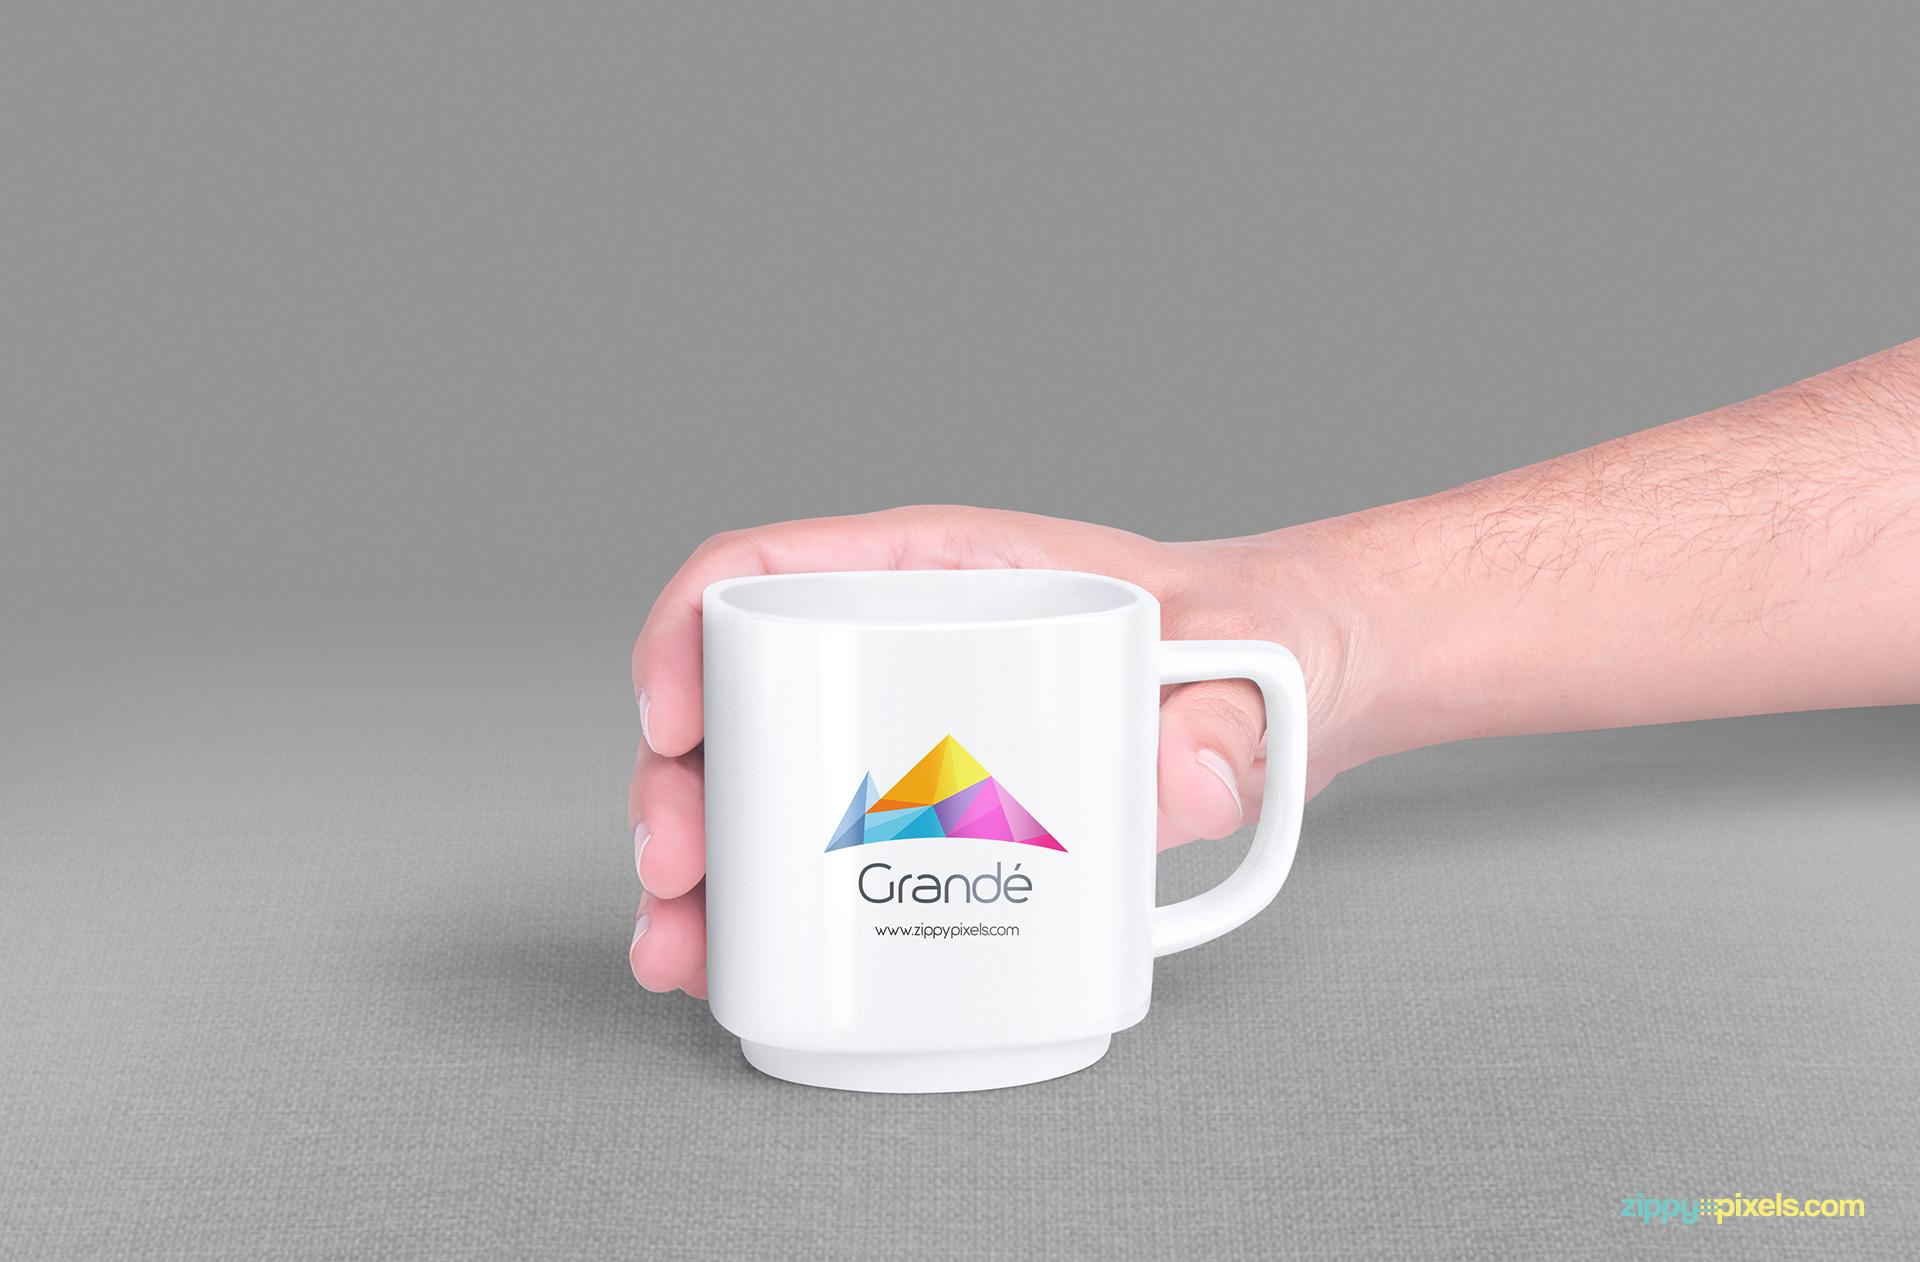 Professionally designed premium mug mockup.